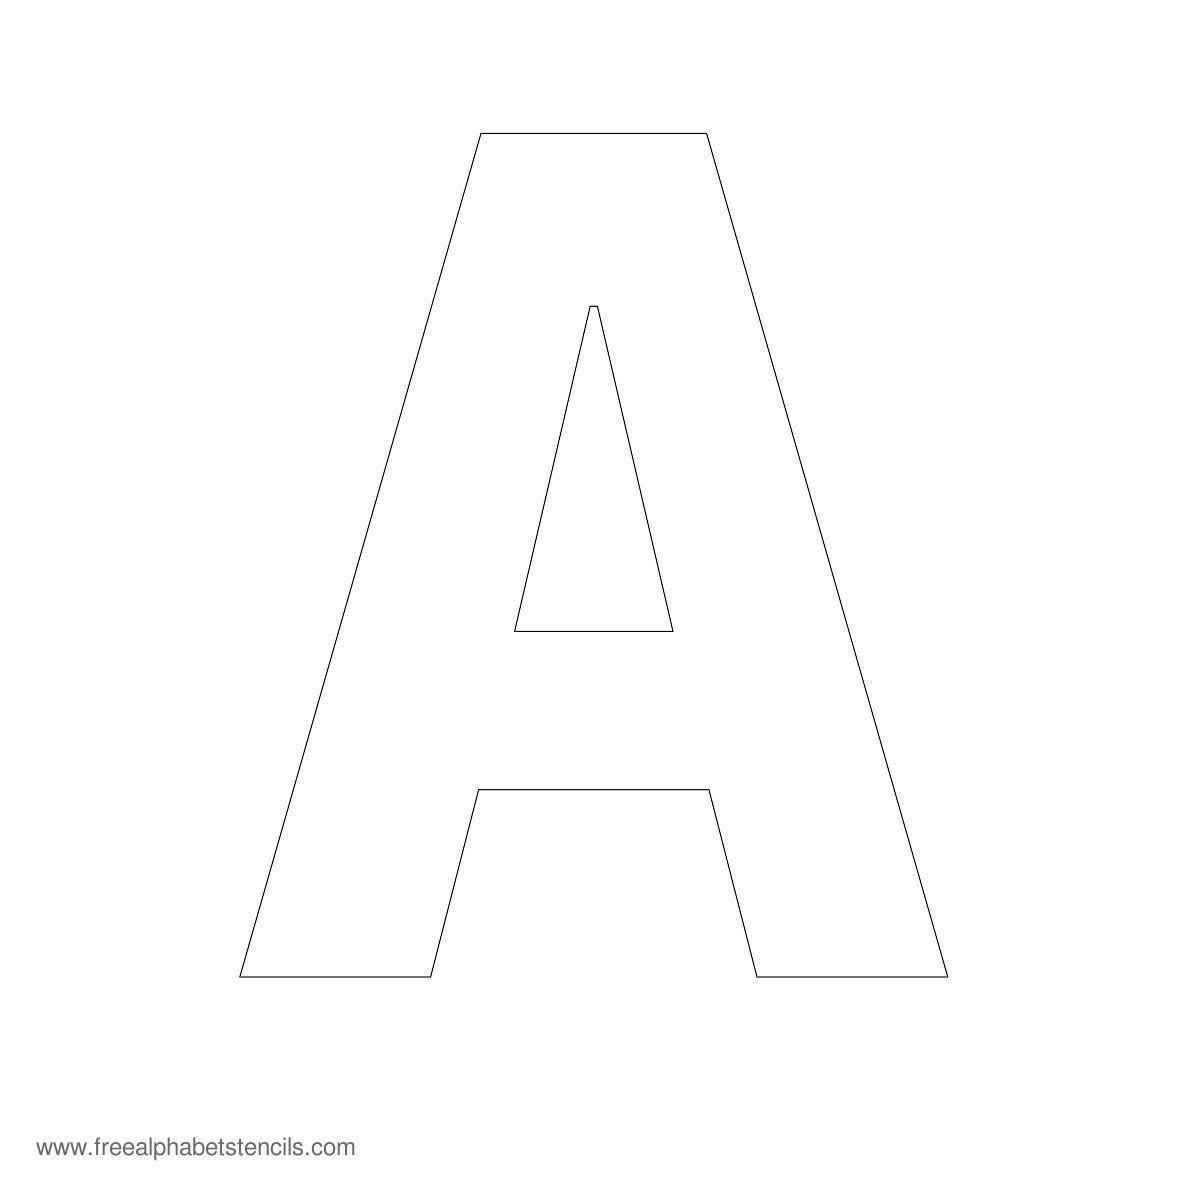 Free Printable Fancy Letters | Free Printable Large Alphabet Letter - Large Printable Fonts Free